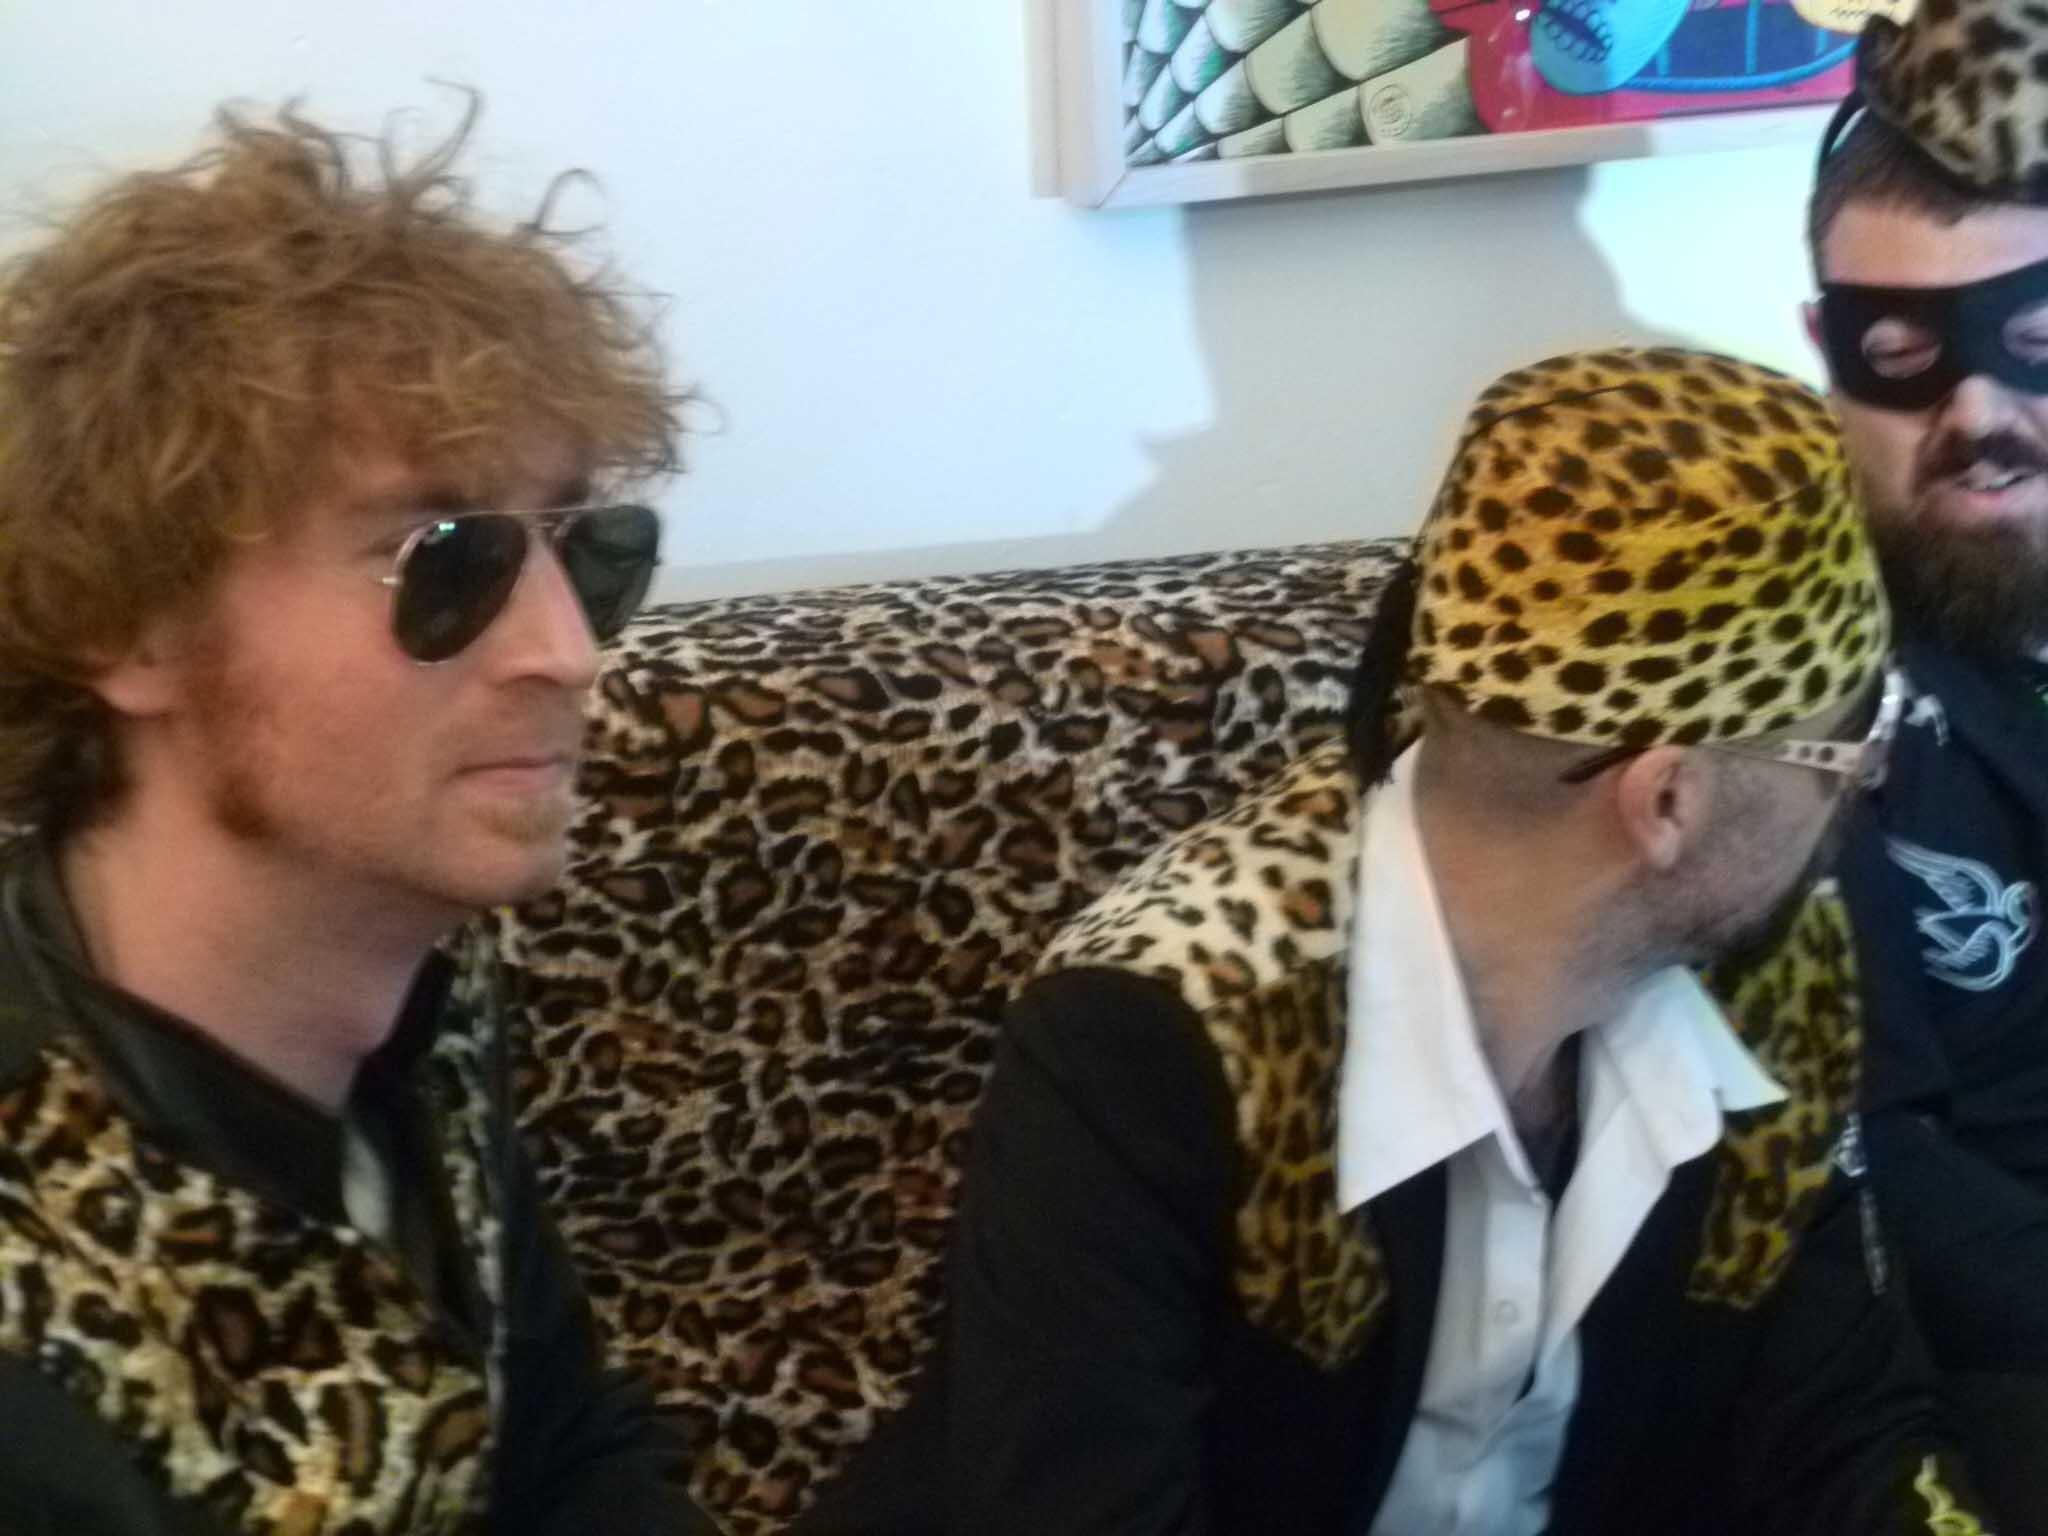 Leopard hats (Barcelona)